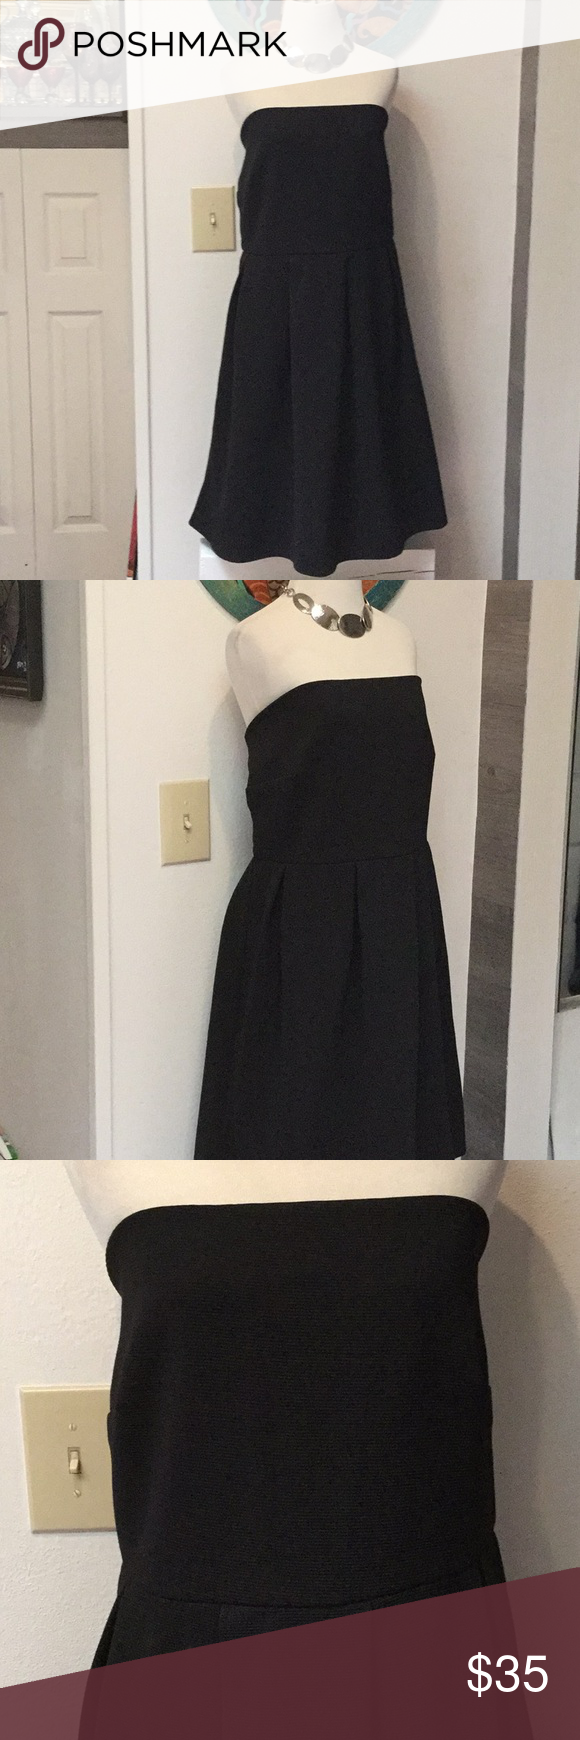 Lane Bryant Black Backless Dress Size 14 16 Black Backless Dress Backless Dress Size 14 Dresses [ 1740 x 580 Pixel ]